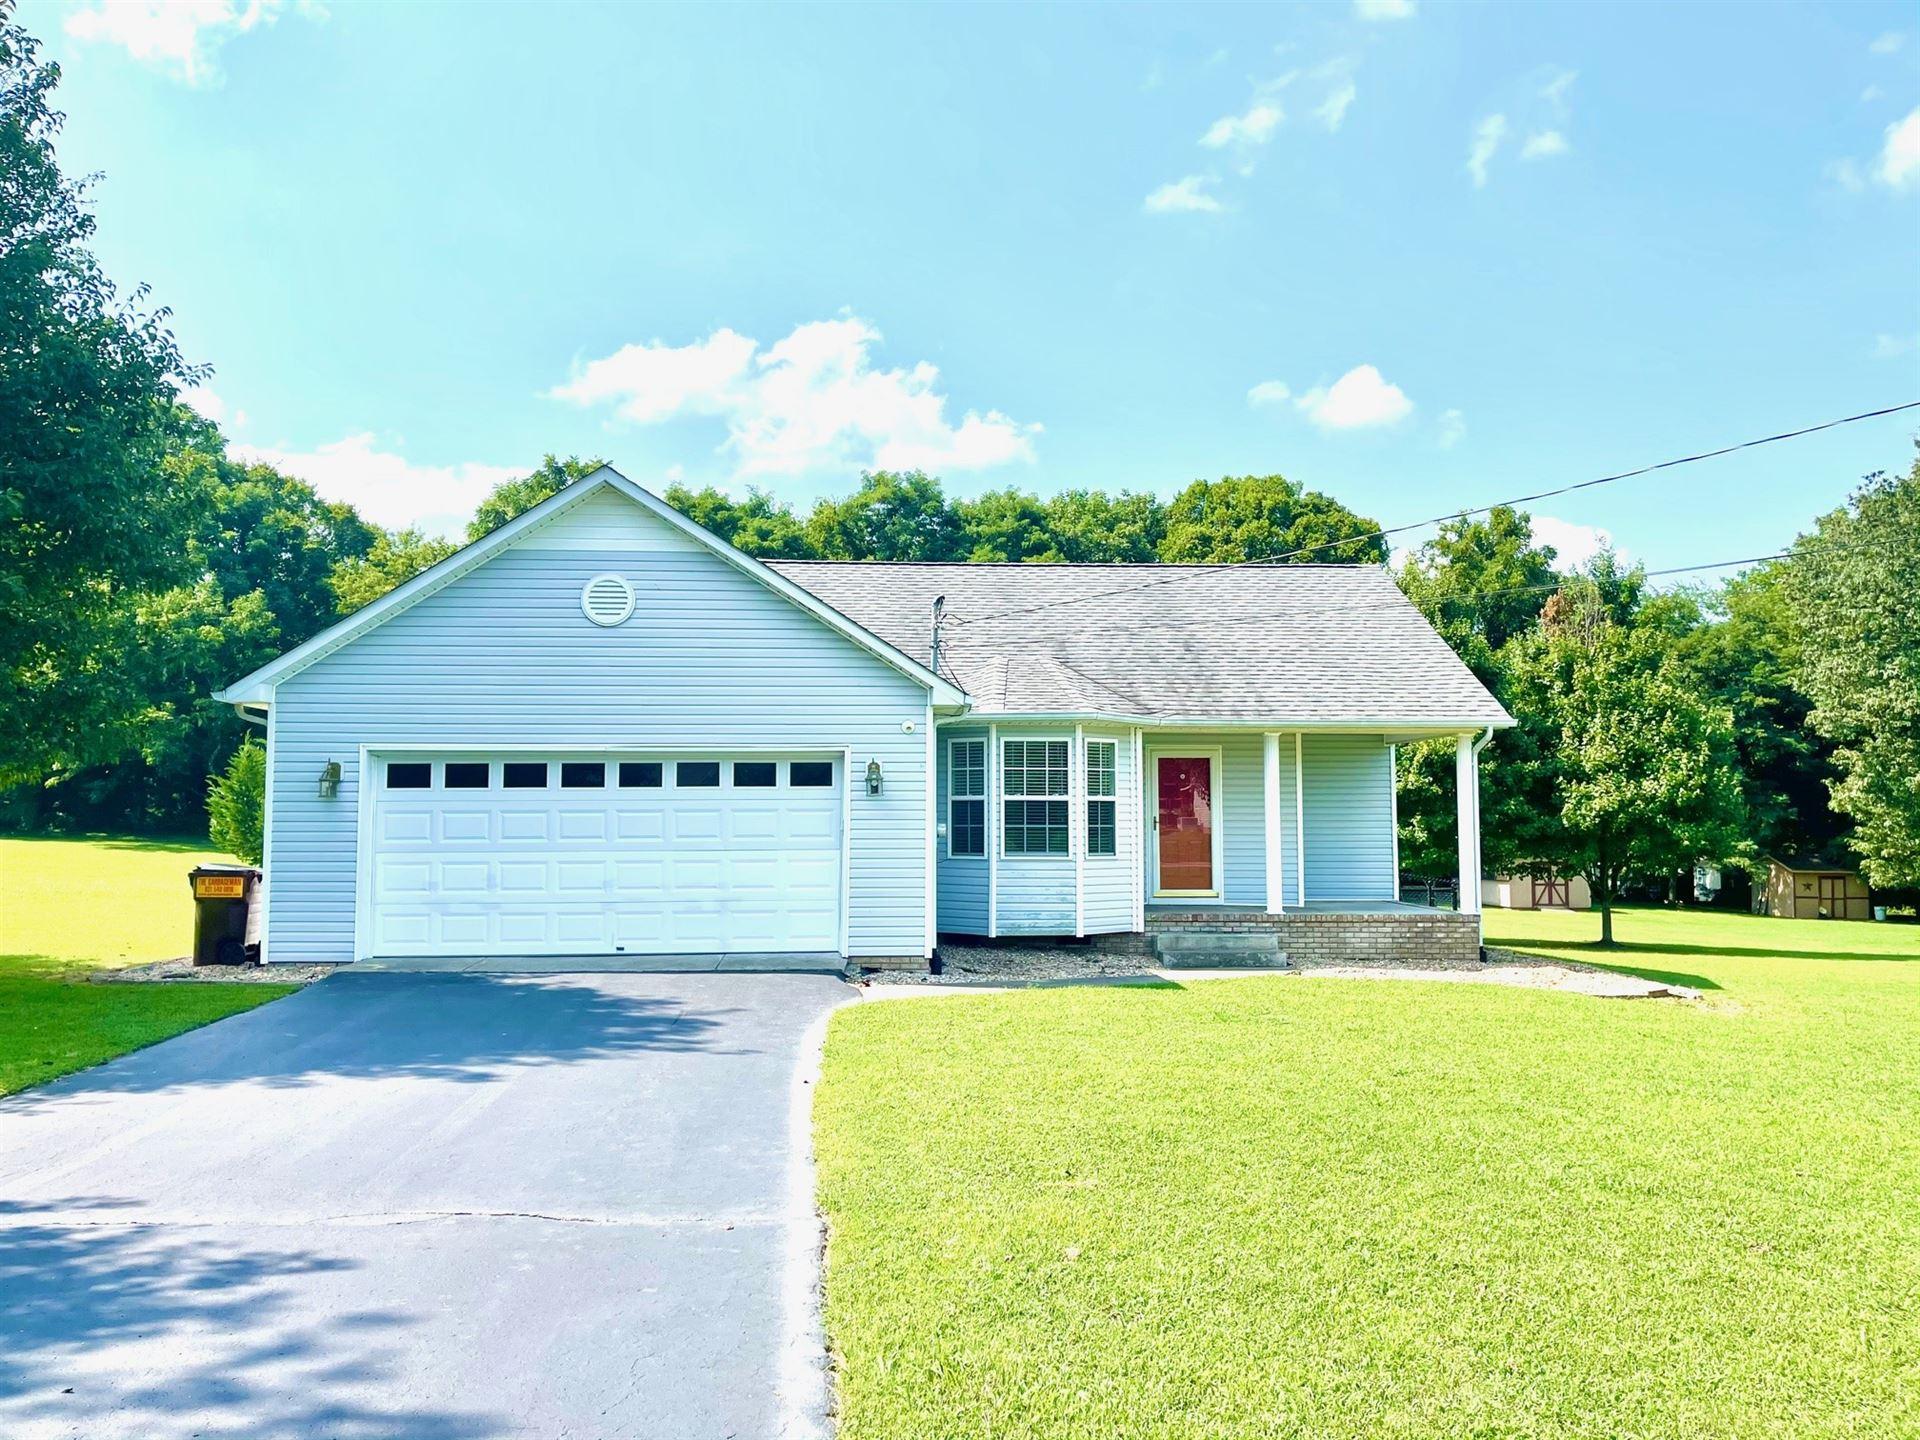 Photo of 536 White Oak Trl, Spring Hill, TN 37174 (MLS # 2276582)